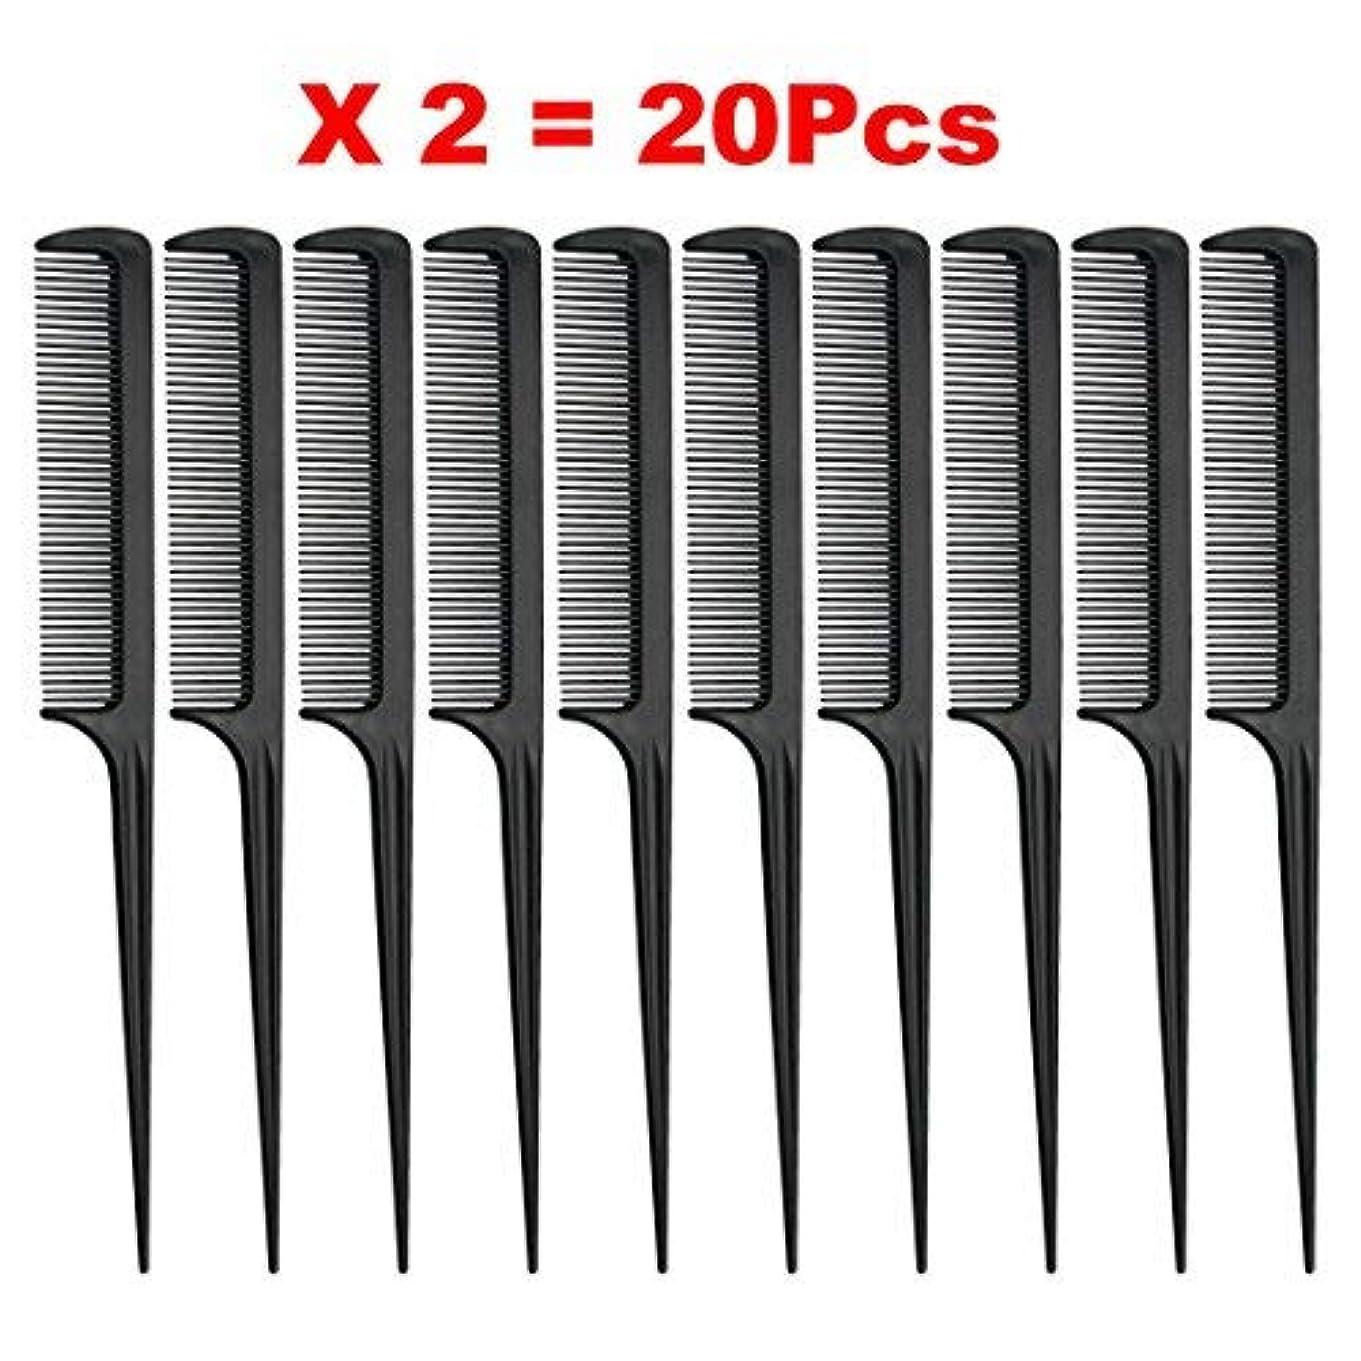 Rat Tail Comb, Black, 8.3 Inch - Pack of 20 (Tail Comb) [並行輸入品]